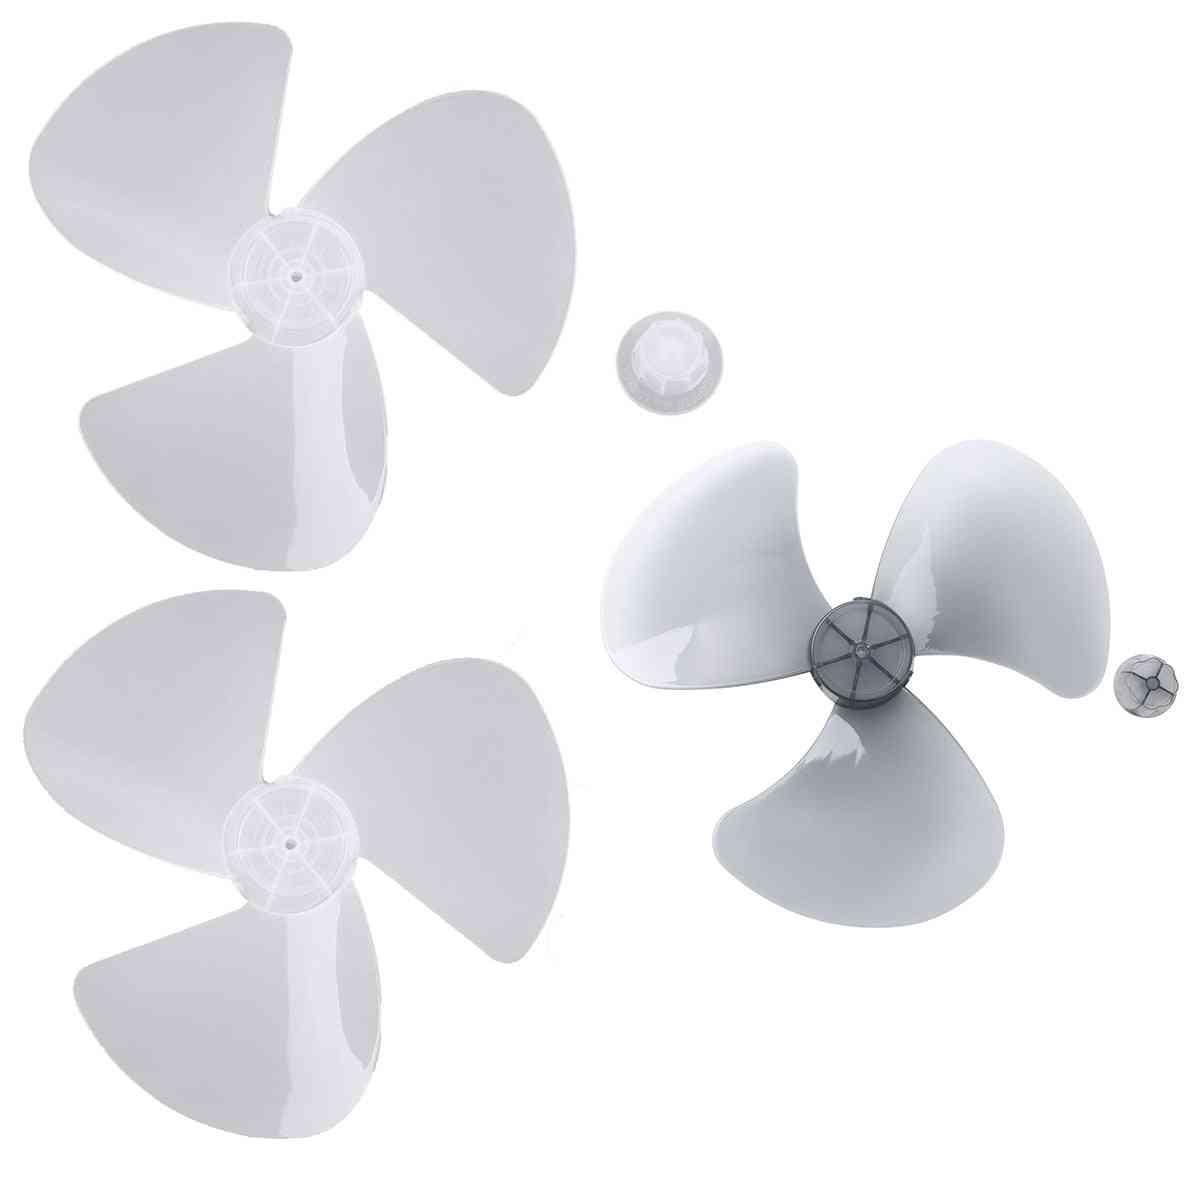 Durable Low Noise Pp Plastic Three Leaves Impeller Fan Blade